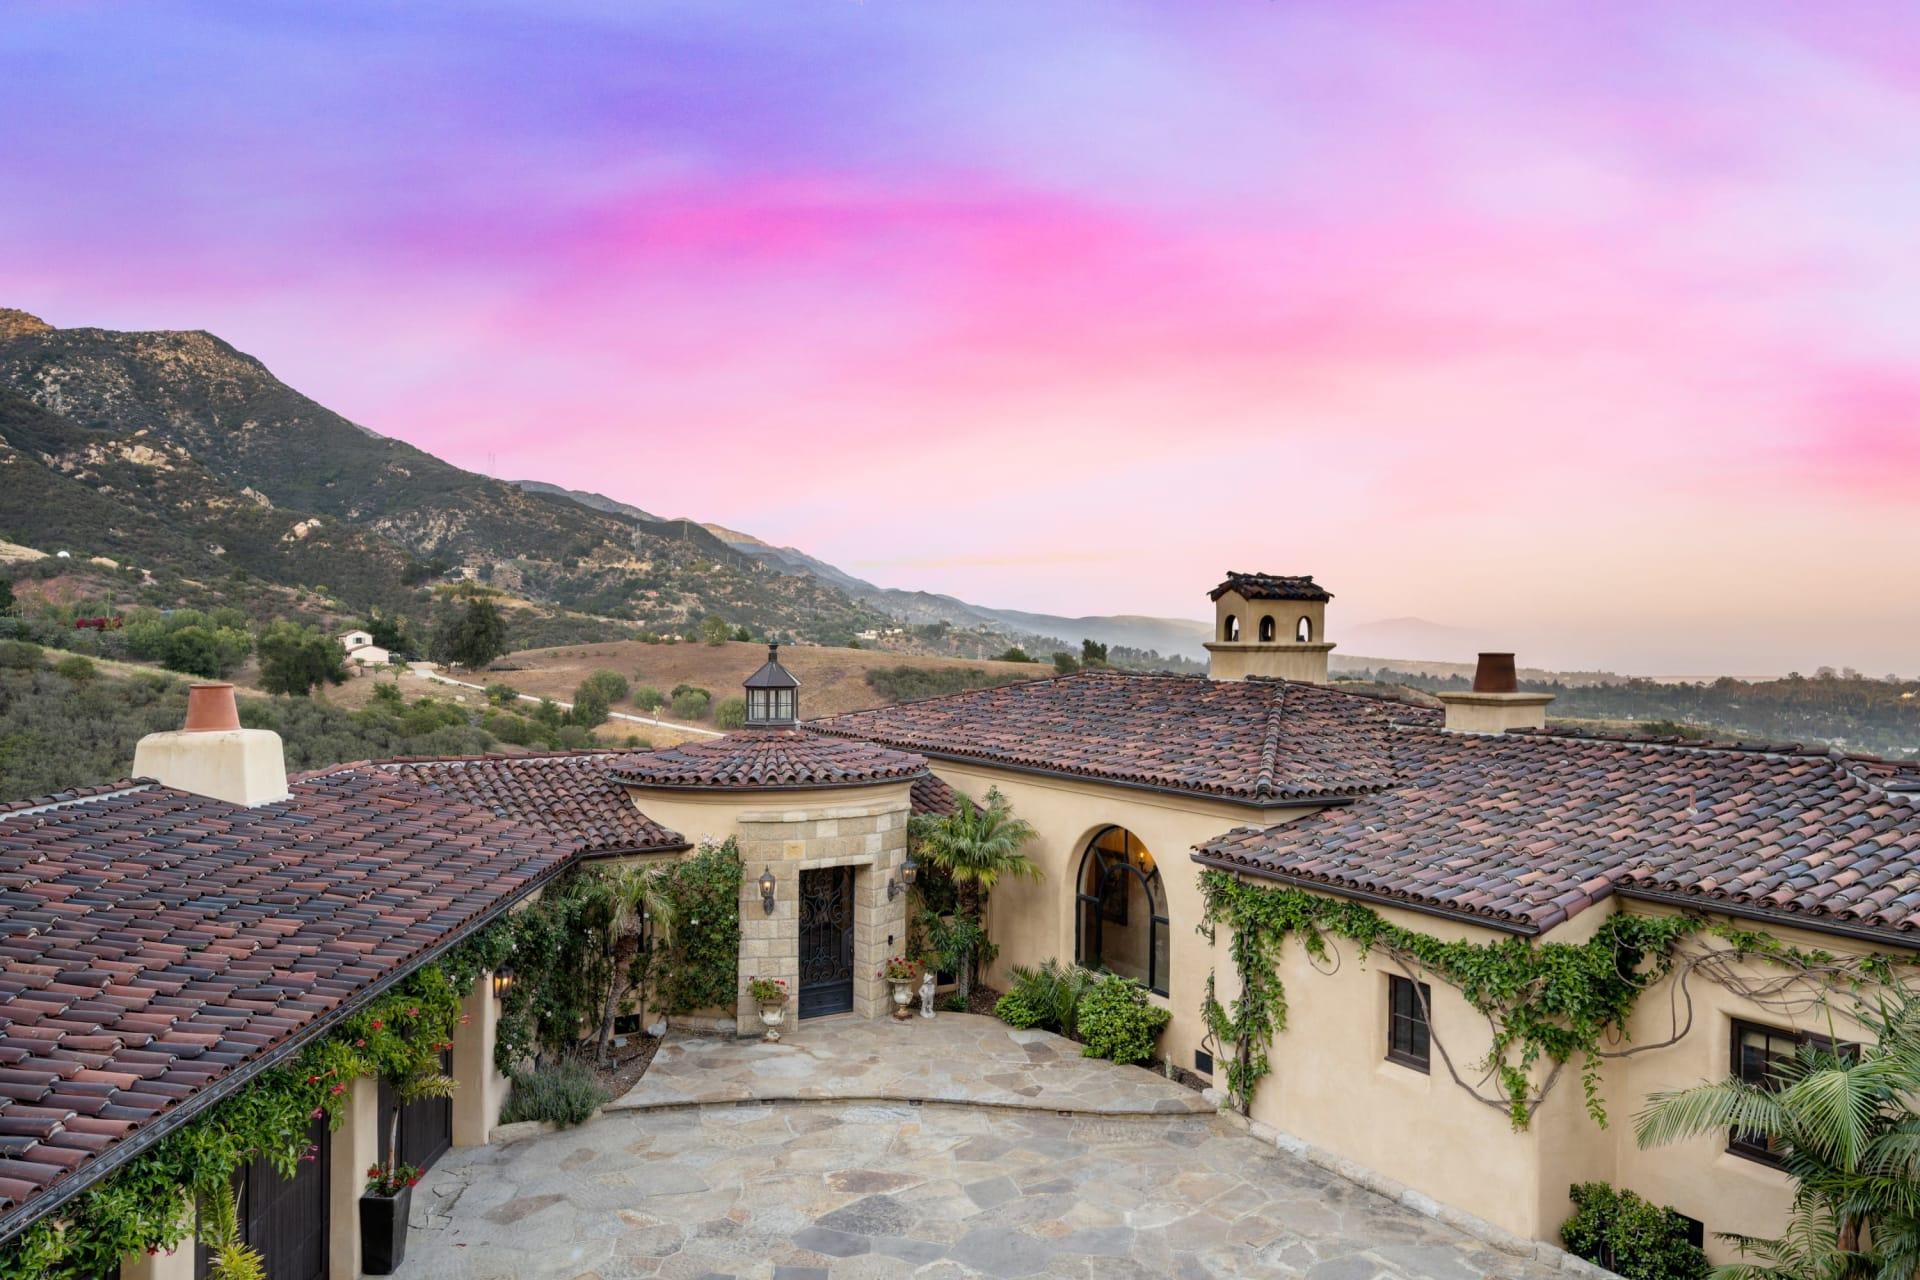 Santa Barbara Housing Bubble?